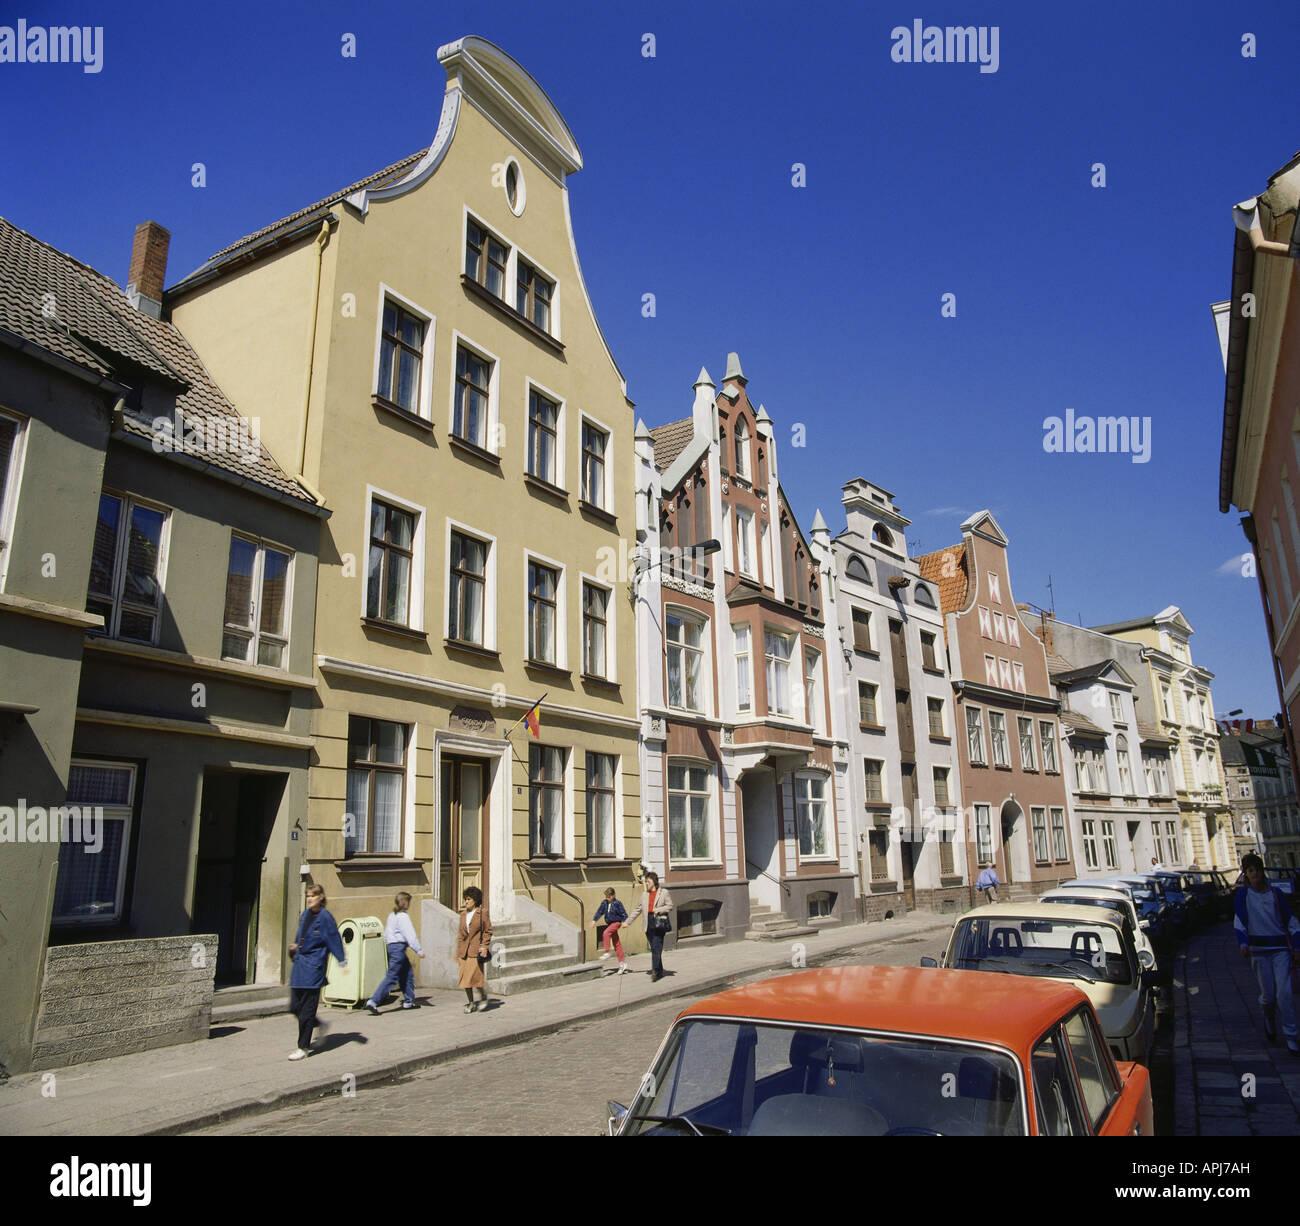 geography / travel, Germany, Mecklenburg-Western Pomerania, Wismar, street scenes, gabled houses in Bohrstraße, - Stock Image